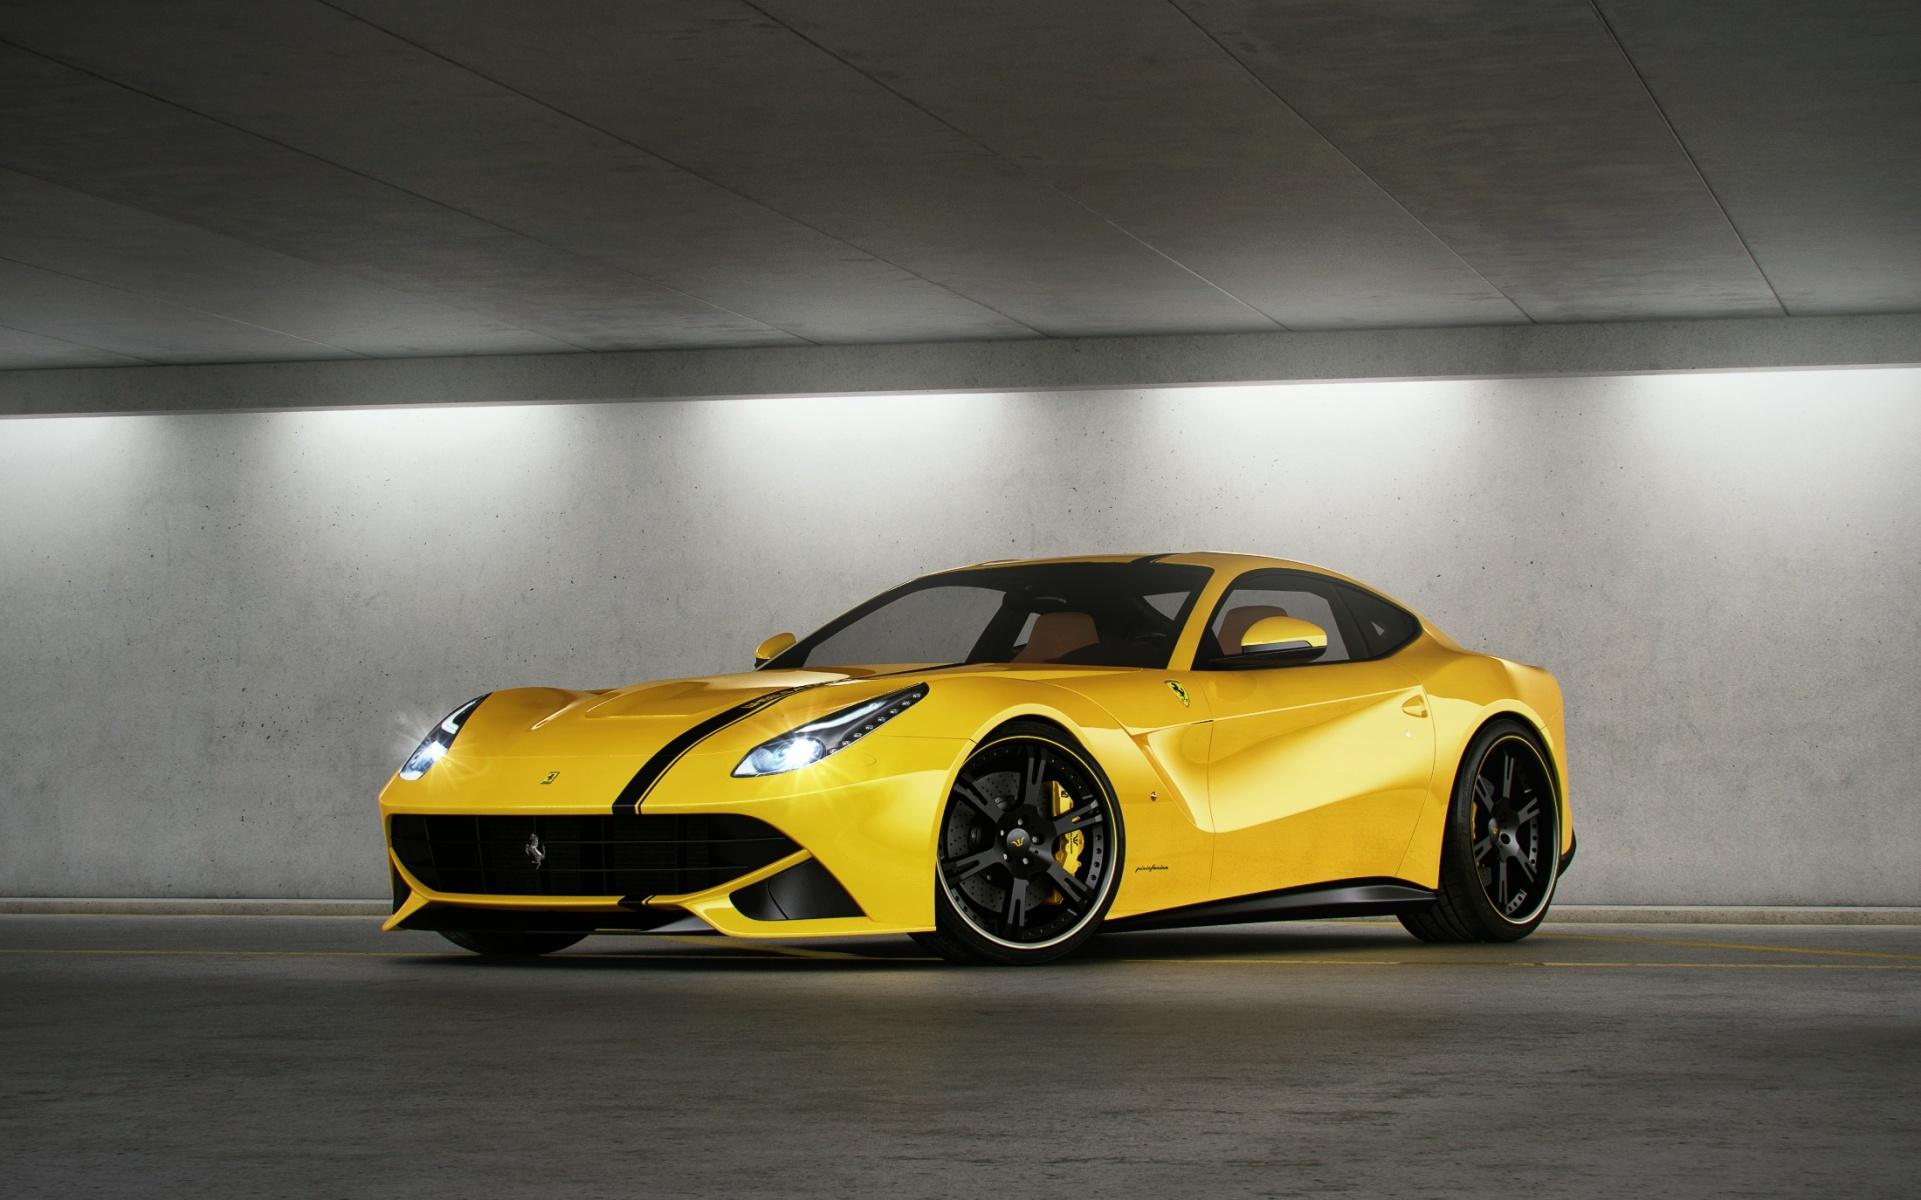 желтый спортивный автомобиль Ferrari F12 Berlinetta Wheelsandmore  № 1564280 без смс